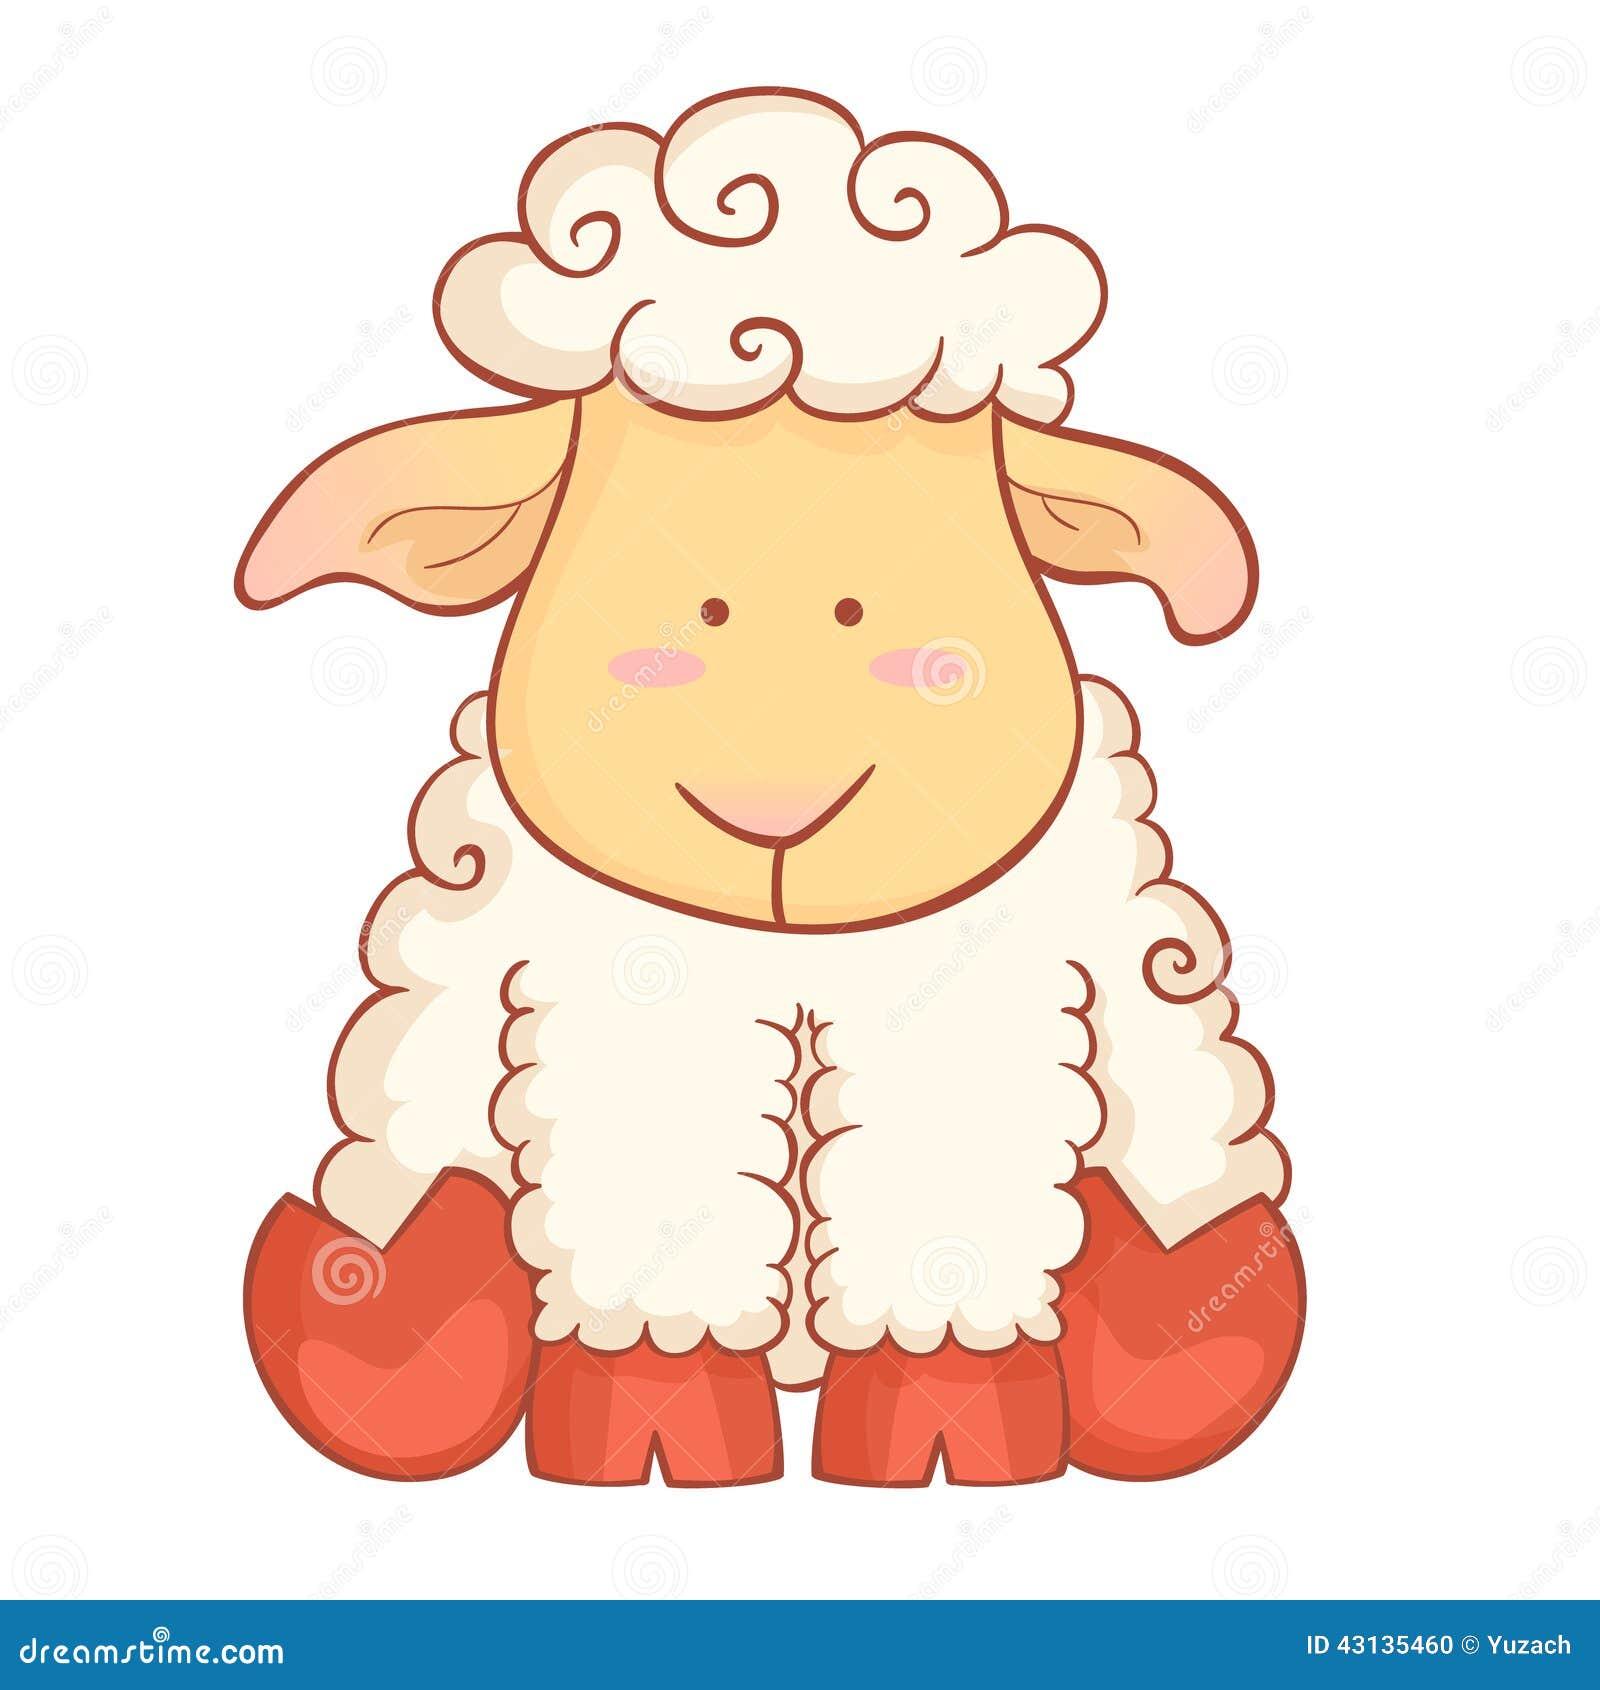 Cute sheep character of chinese new year symbol stock vector cute sheep character of chinese new year symbol biocorpaavc